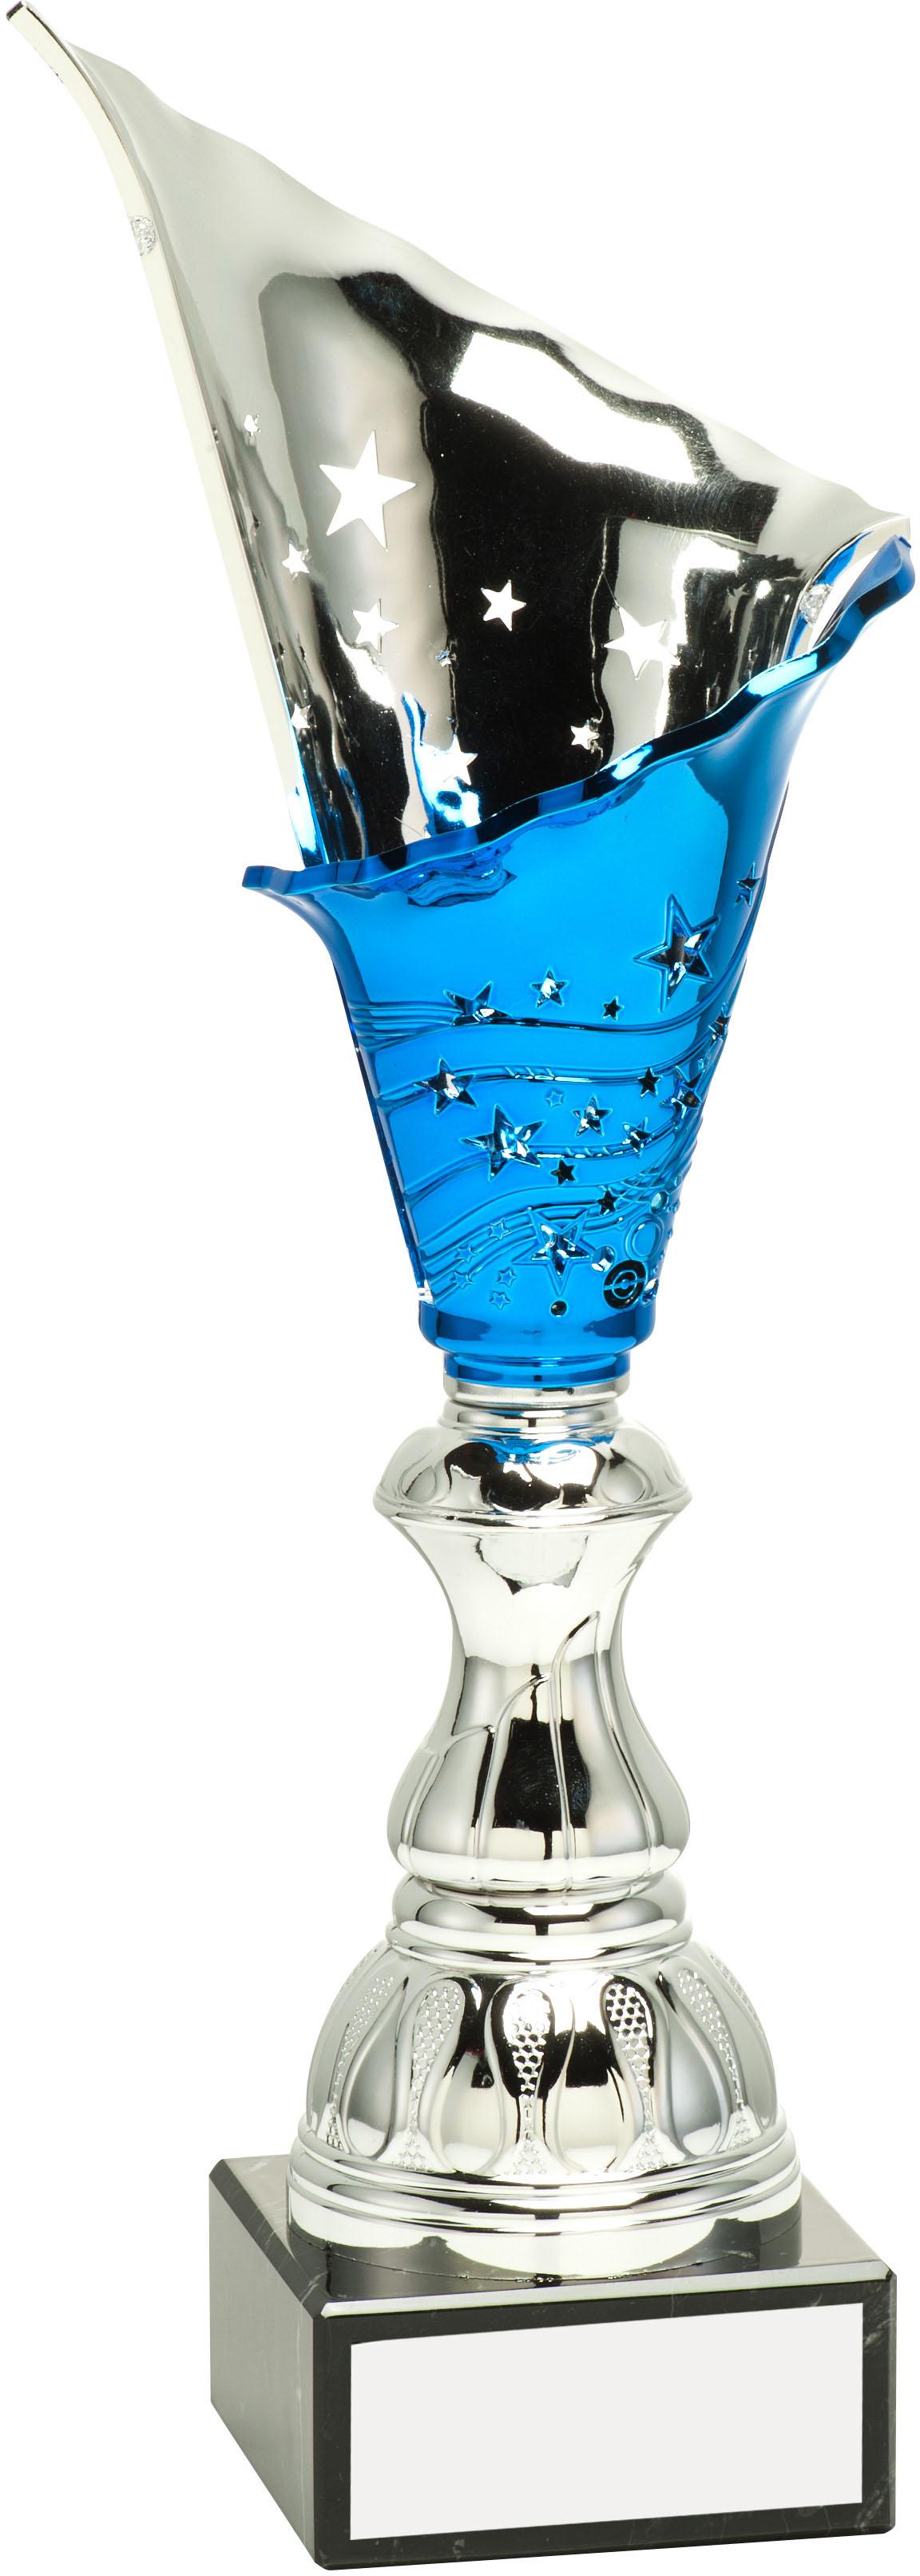 "Silver & Blue Spiral Trophy Cup 30cm (11.75"")"